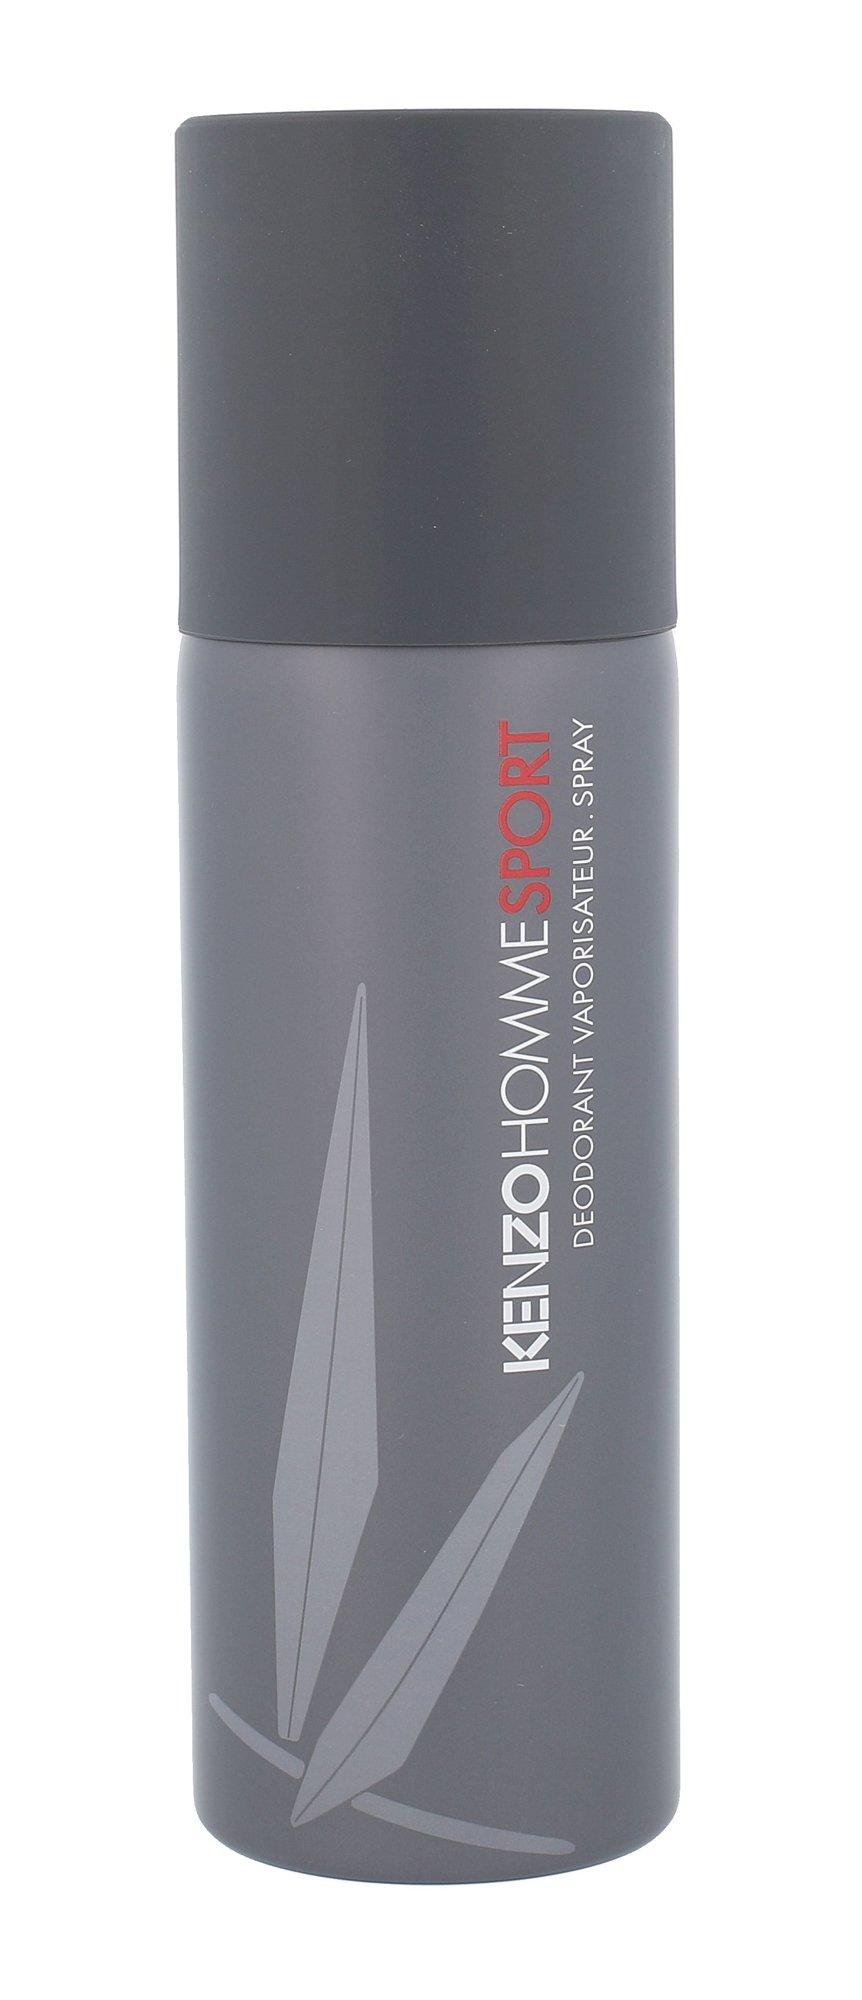 KENZO Kenzo Homme Sport Deodorant 150ml